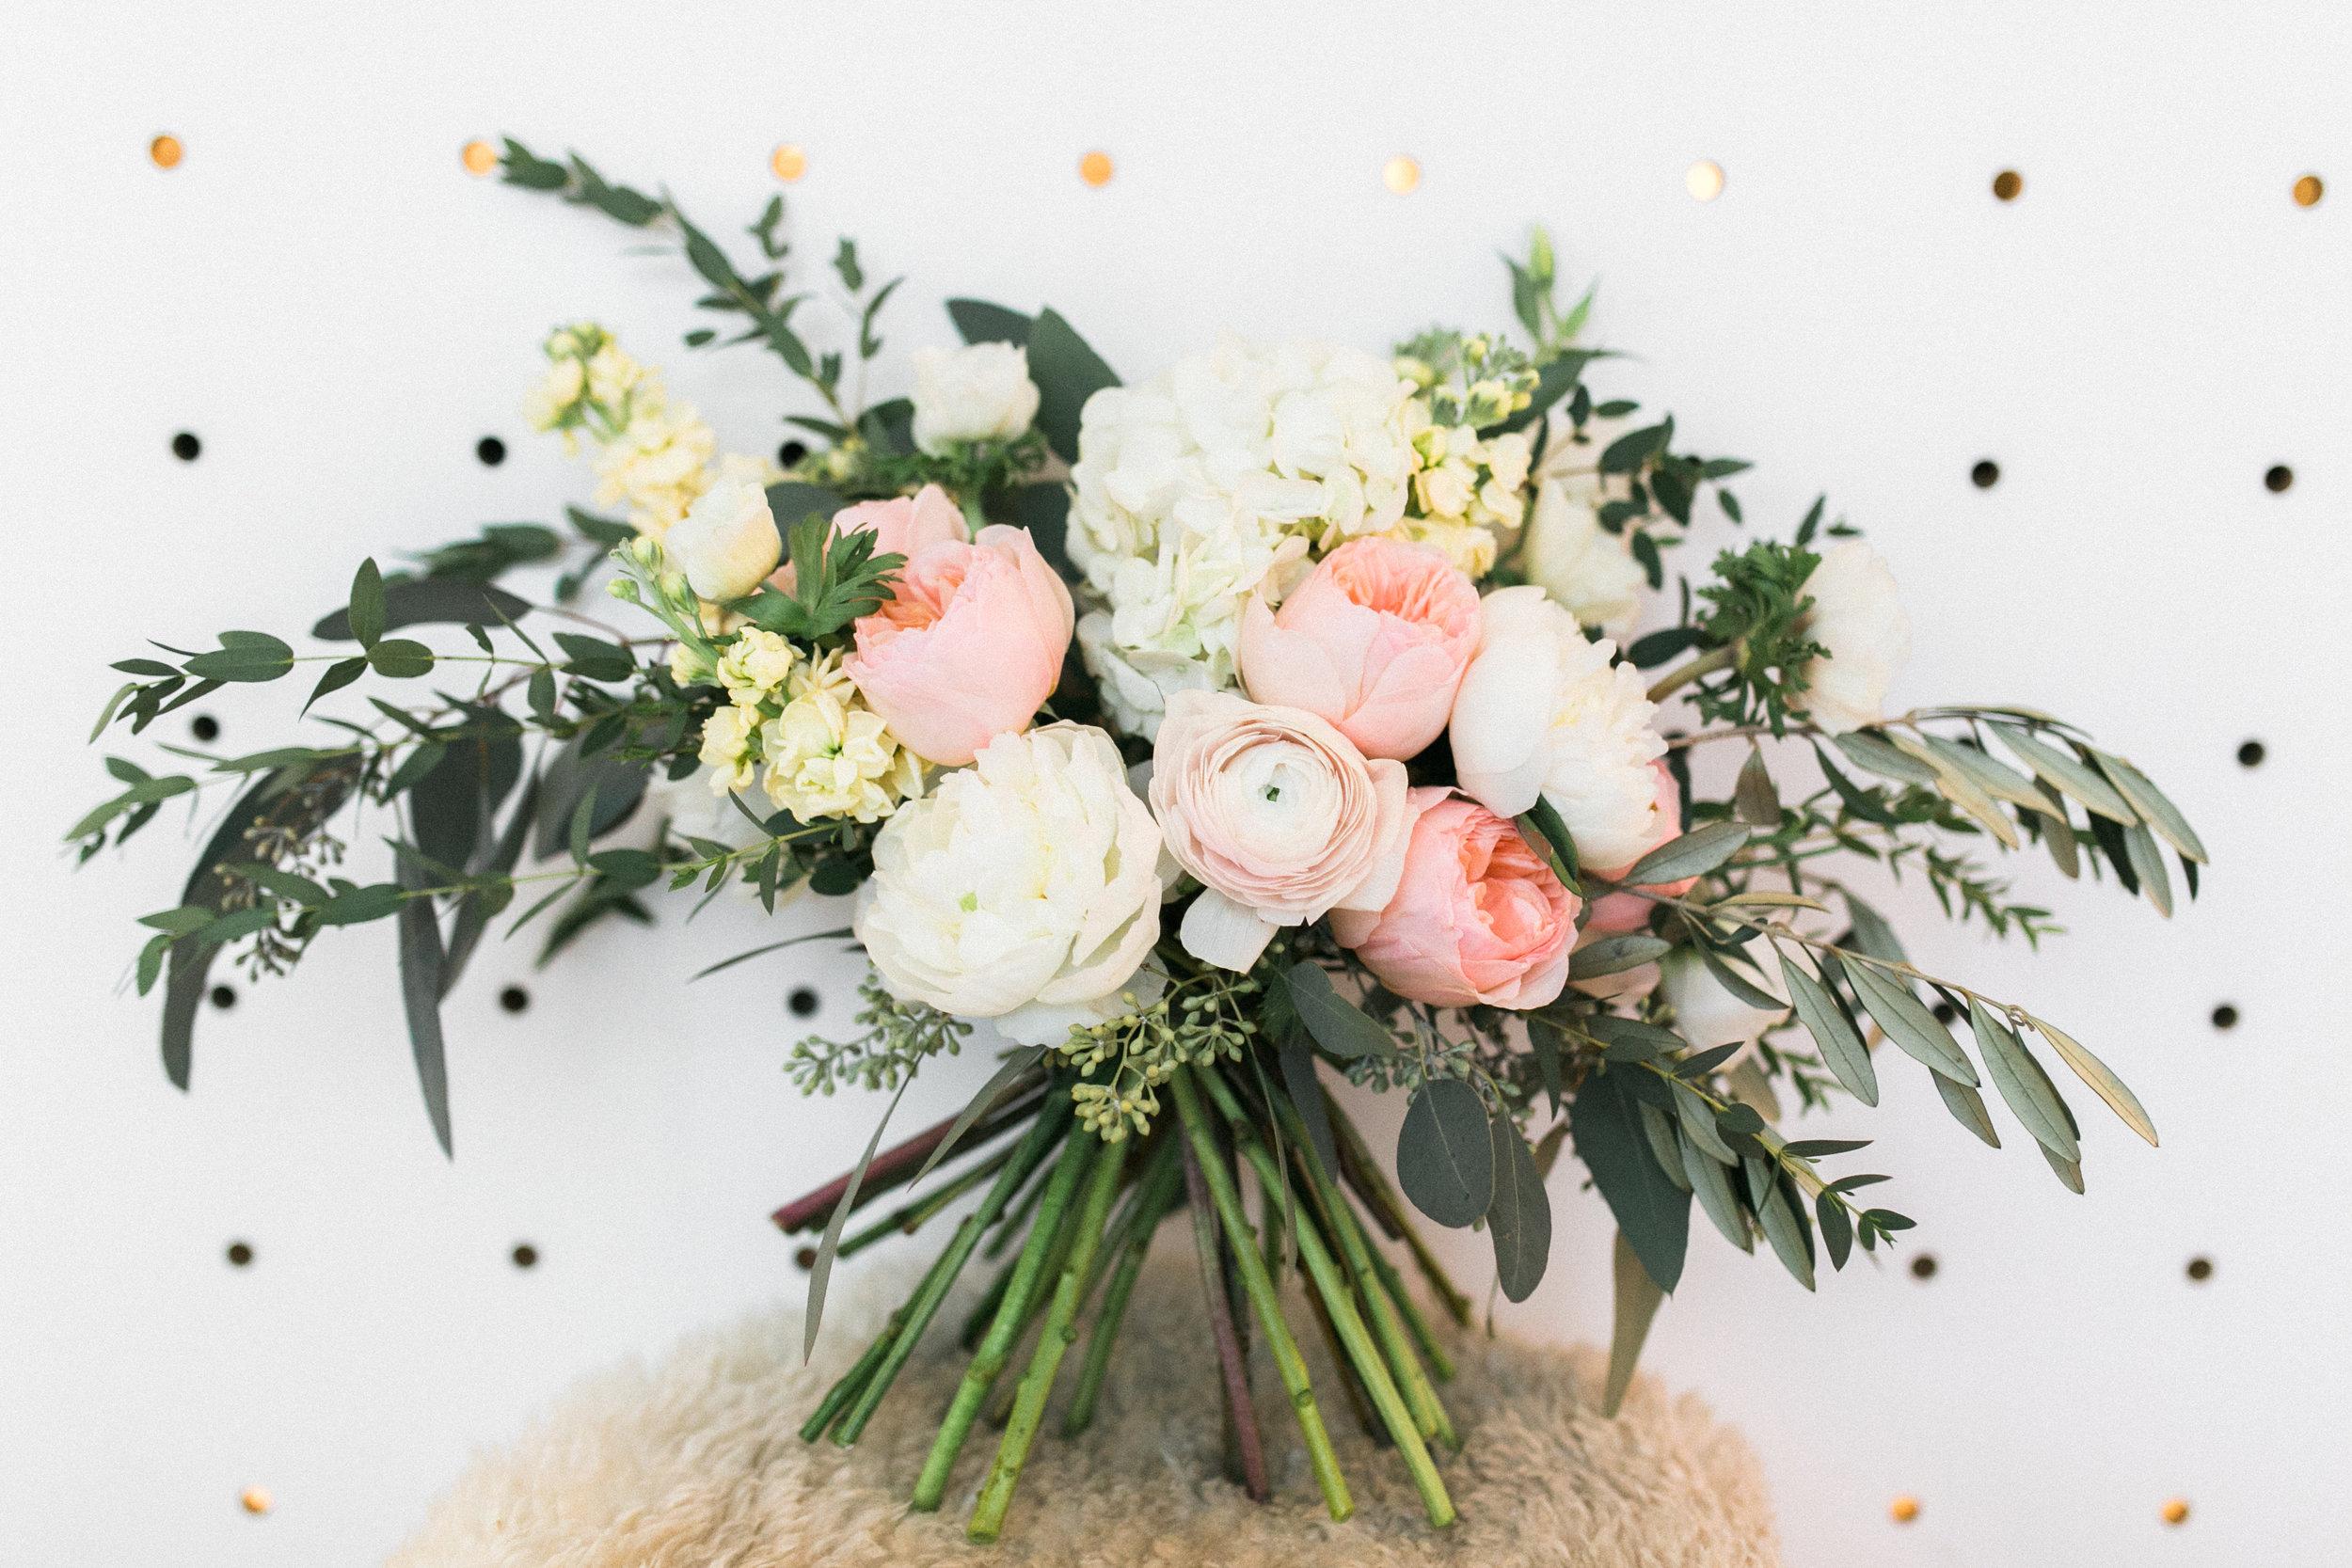 Penticton Wedding Florist